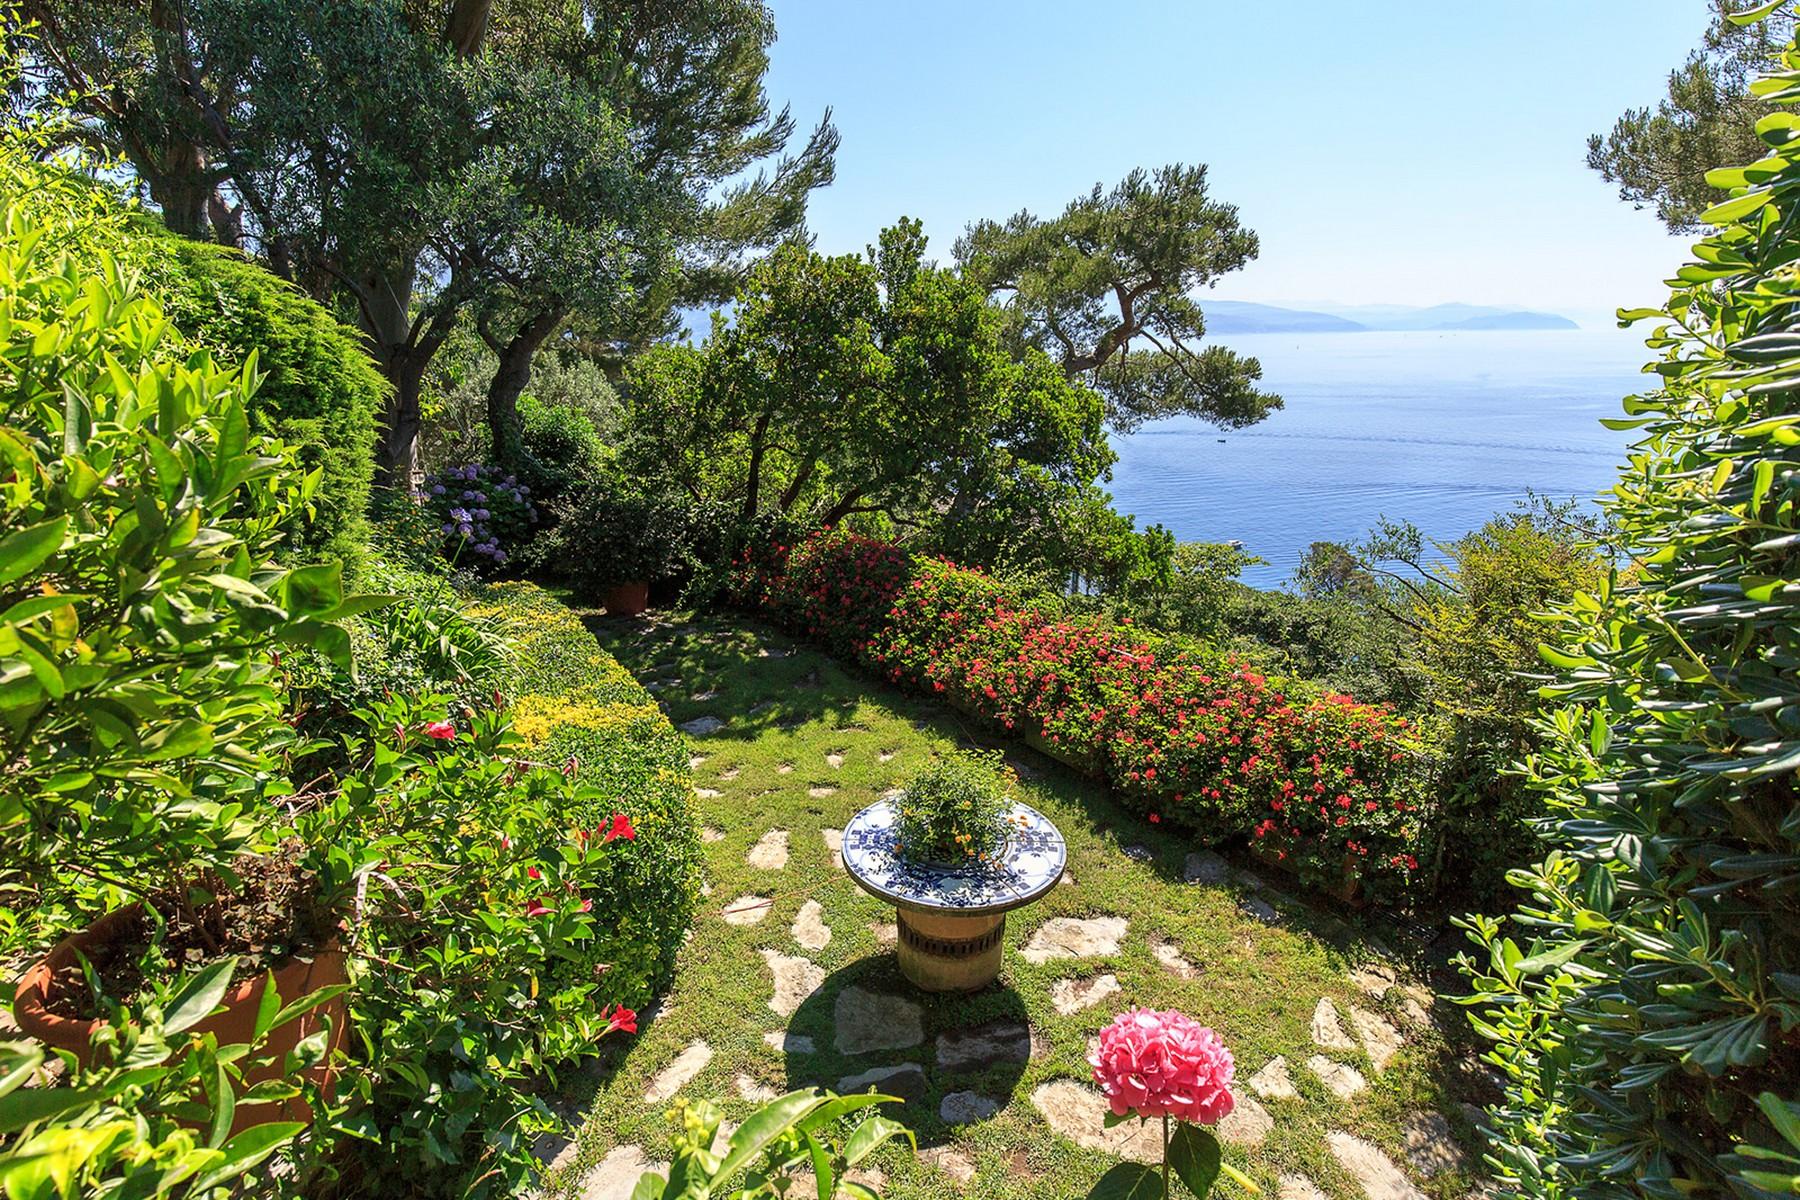 Villa in Vendita a Santa Margherita Ligure: 5 locali, 440 mq - Foto 2